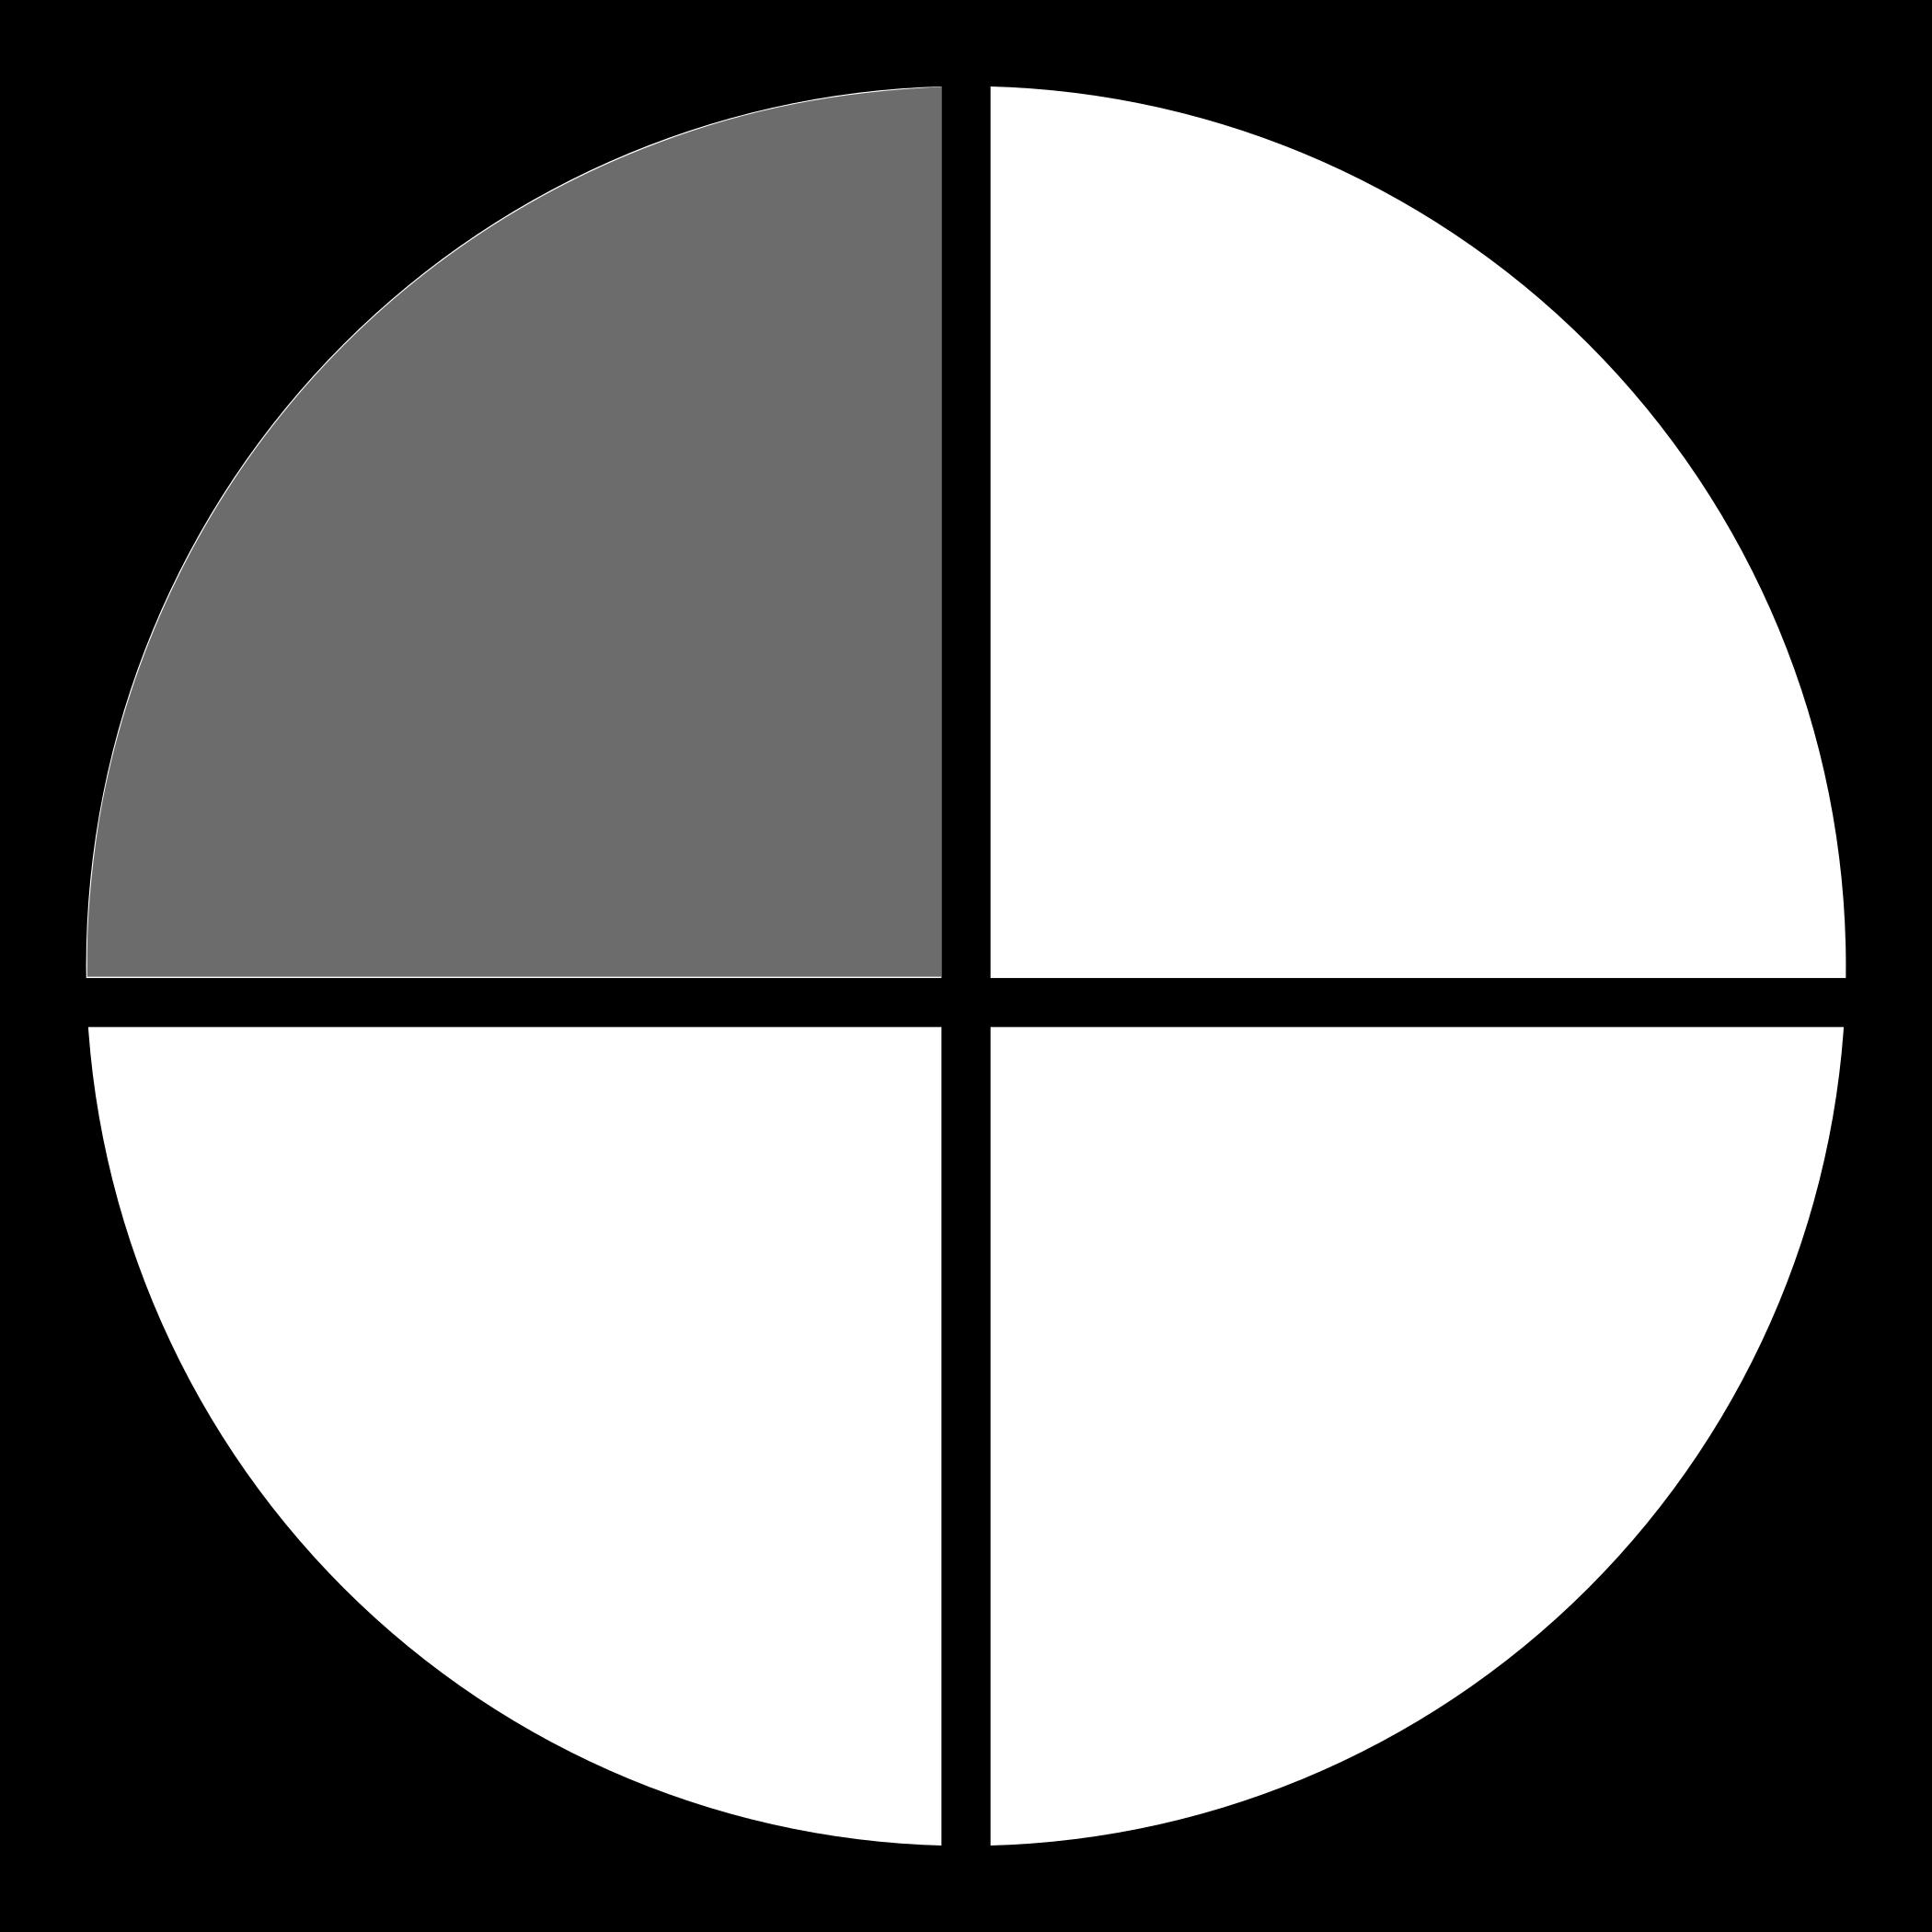 um-quarto-matematica-2